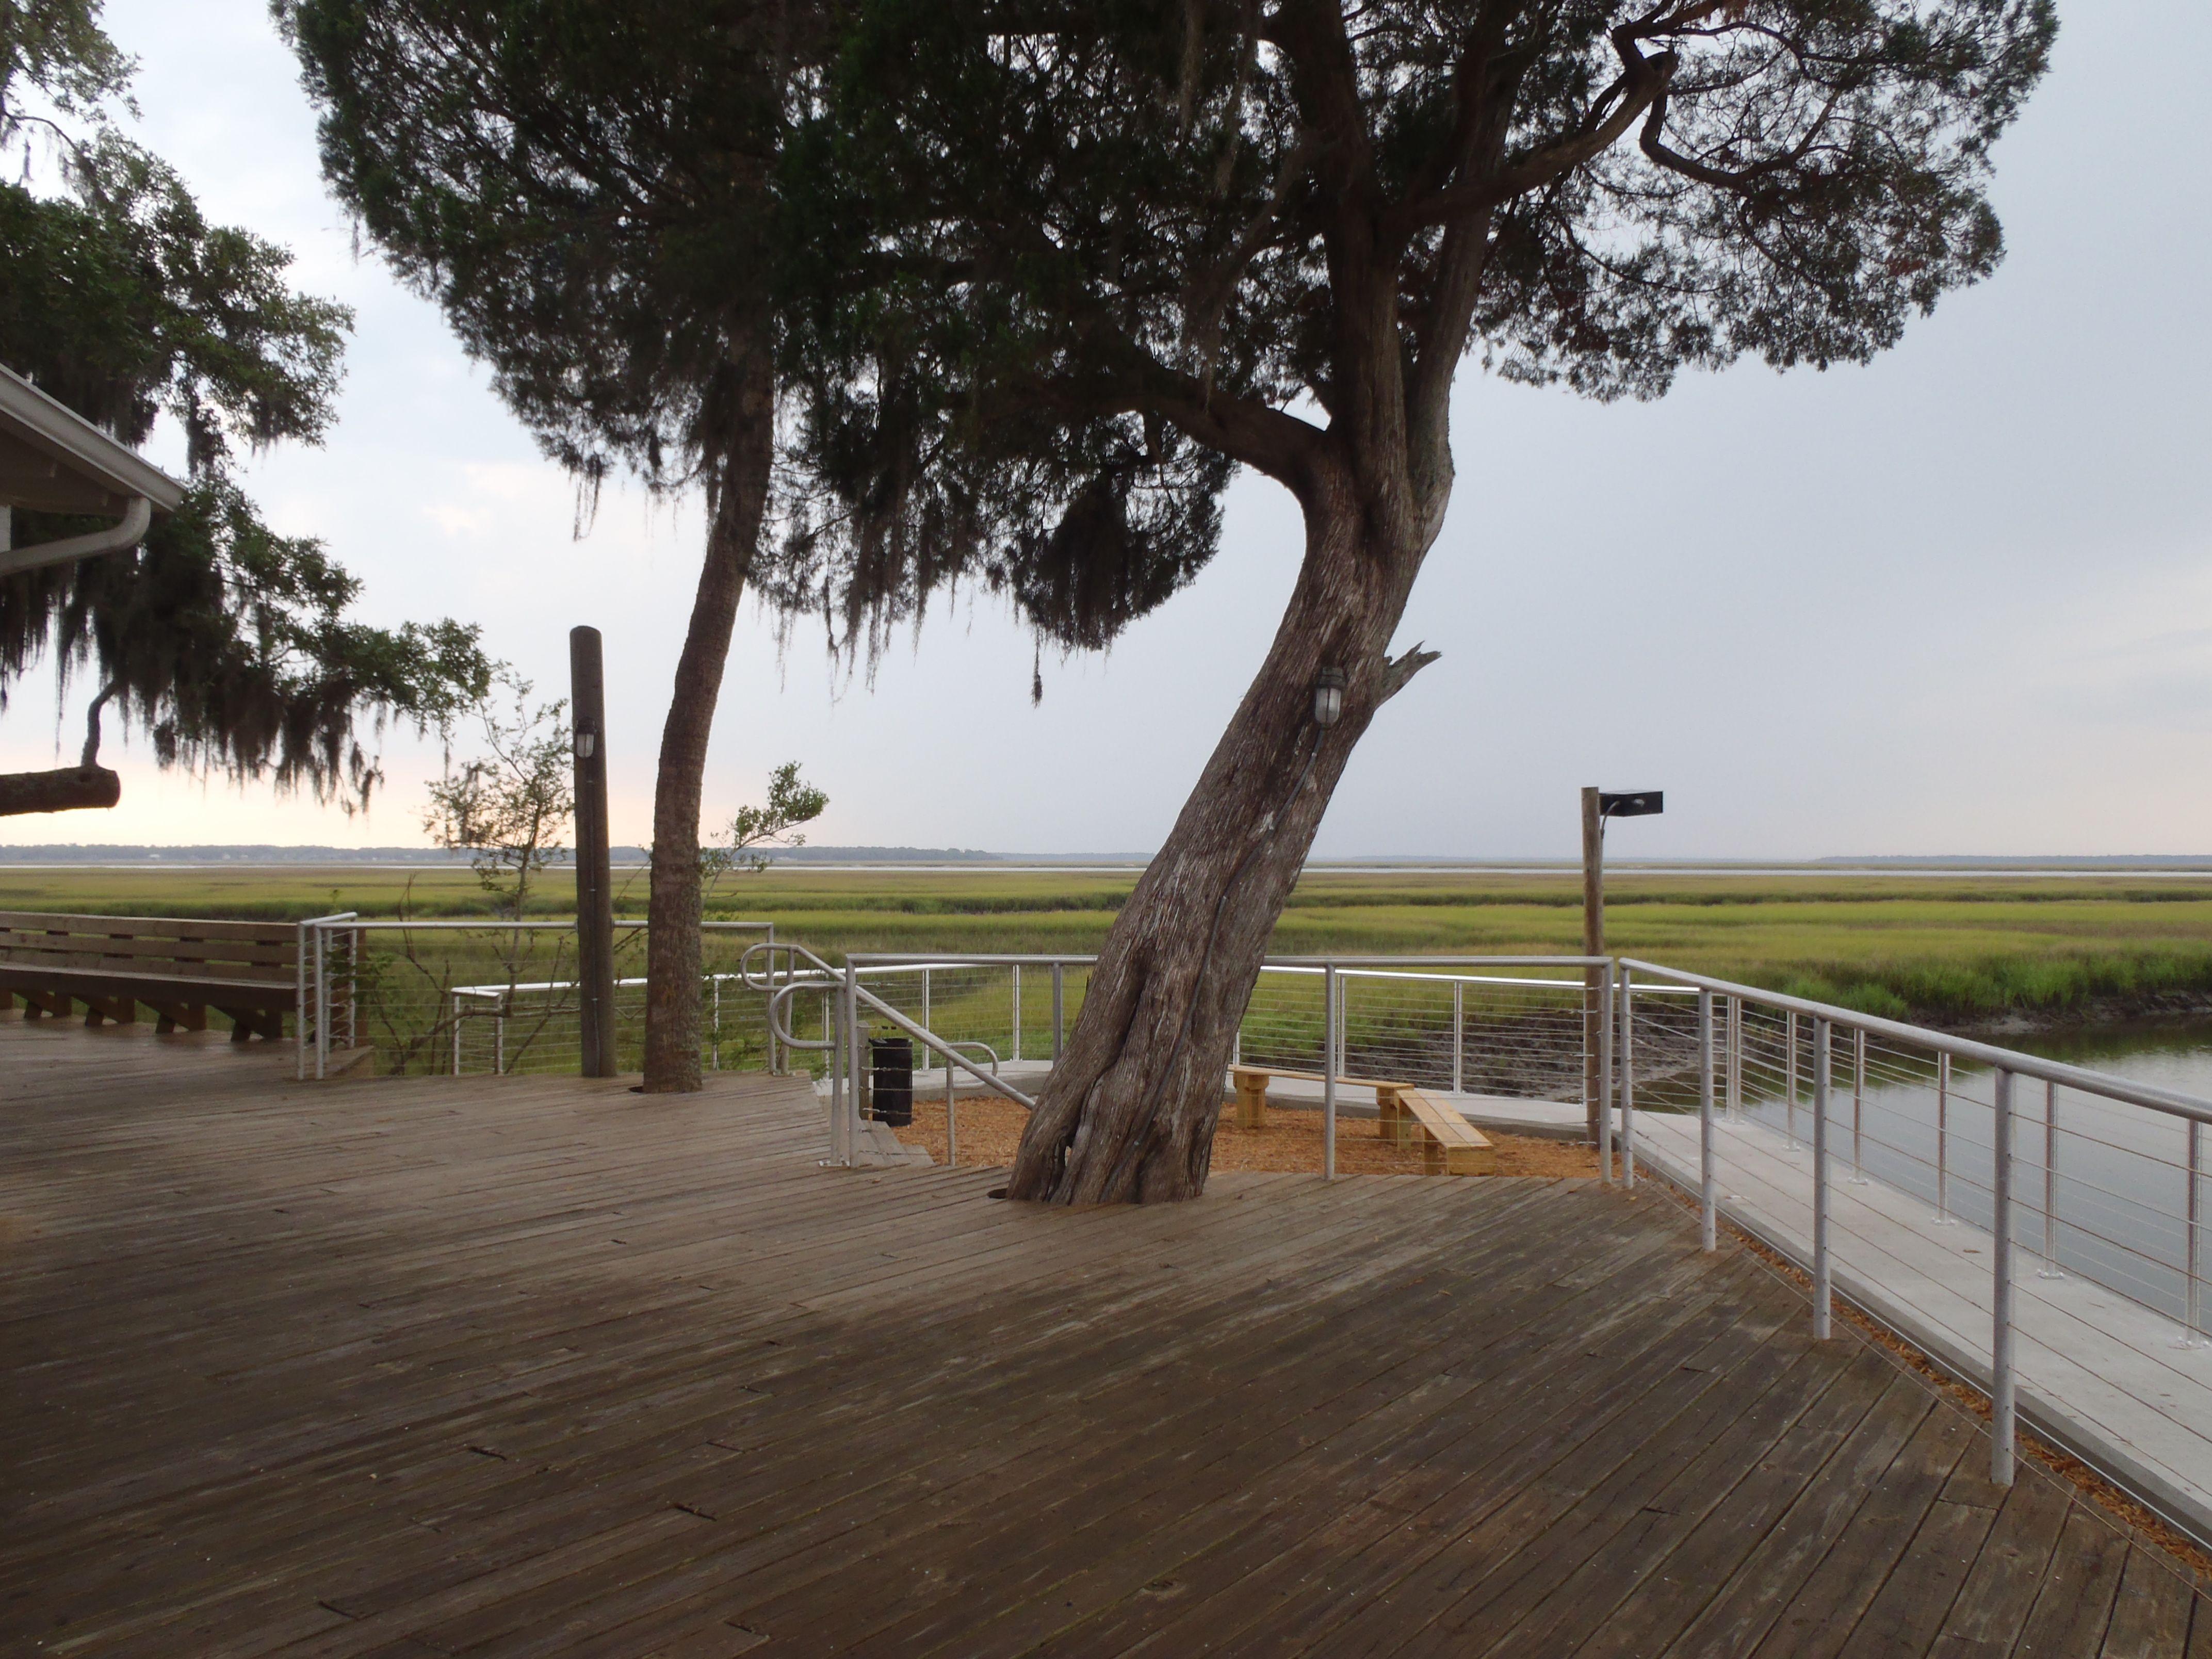 Amelia island christmas tree lighting at amelia island plantation - Wedding Deck Undecorated Walker S Landing Amelia Island Plantation